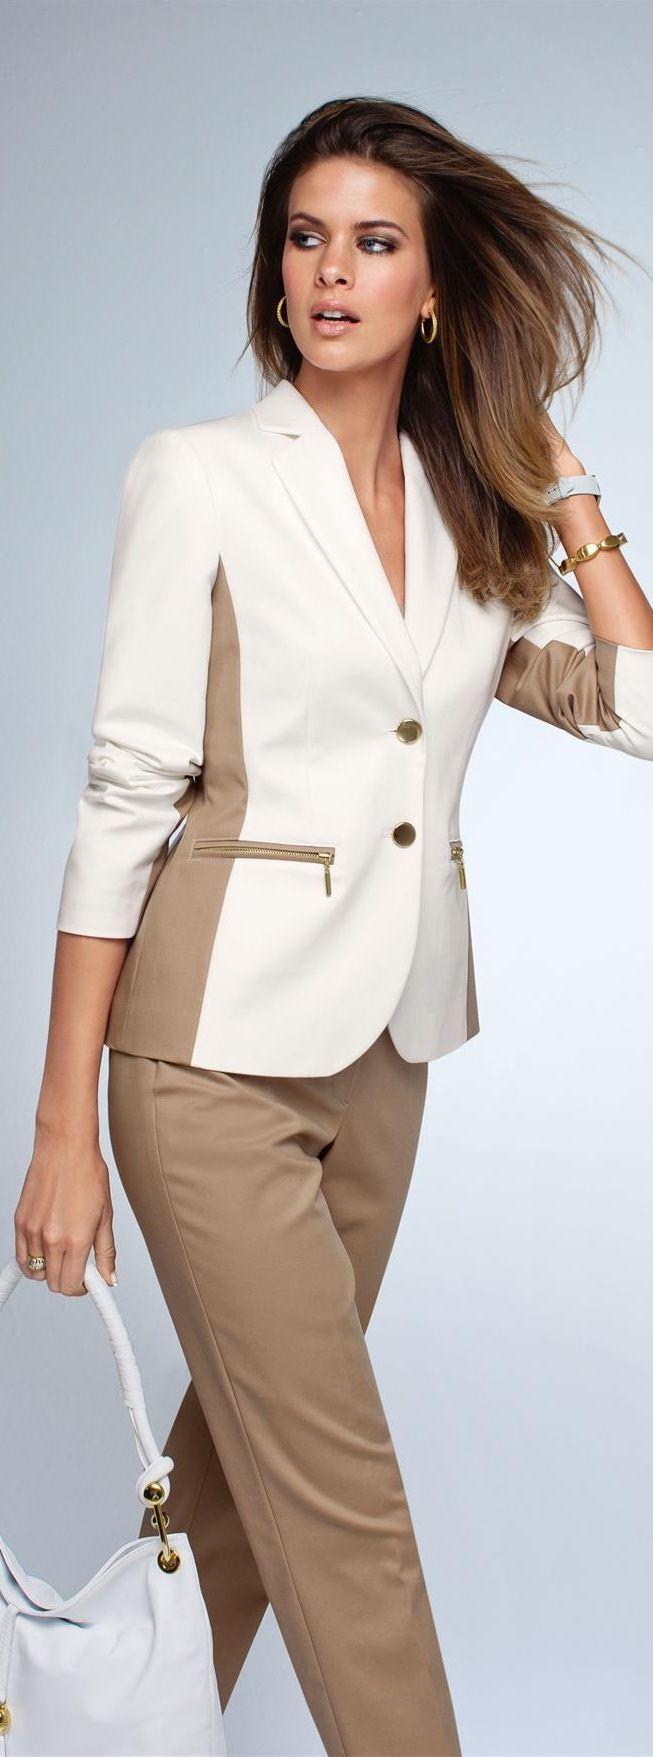 Fashion ~ Madeleine by Shelly ✦  from my board: https://www.pinterest.com/sclarkjordan/fashion-~-madeleine-by-shelly/